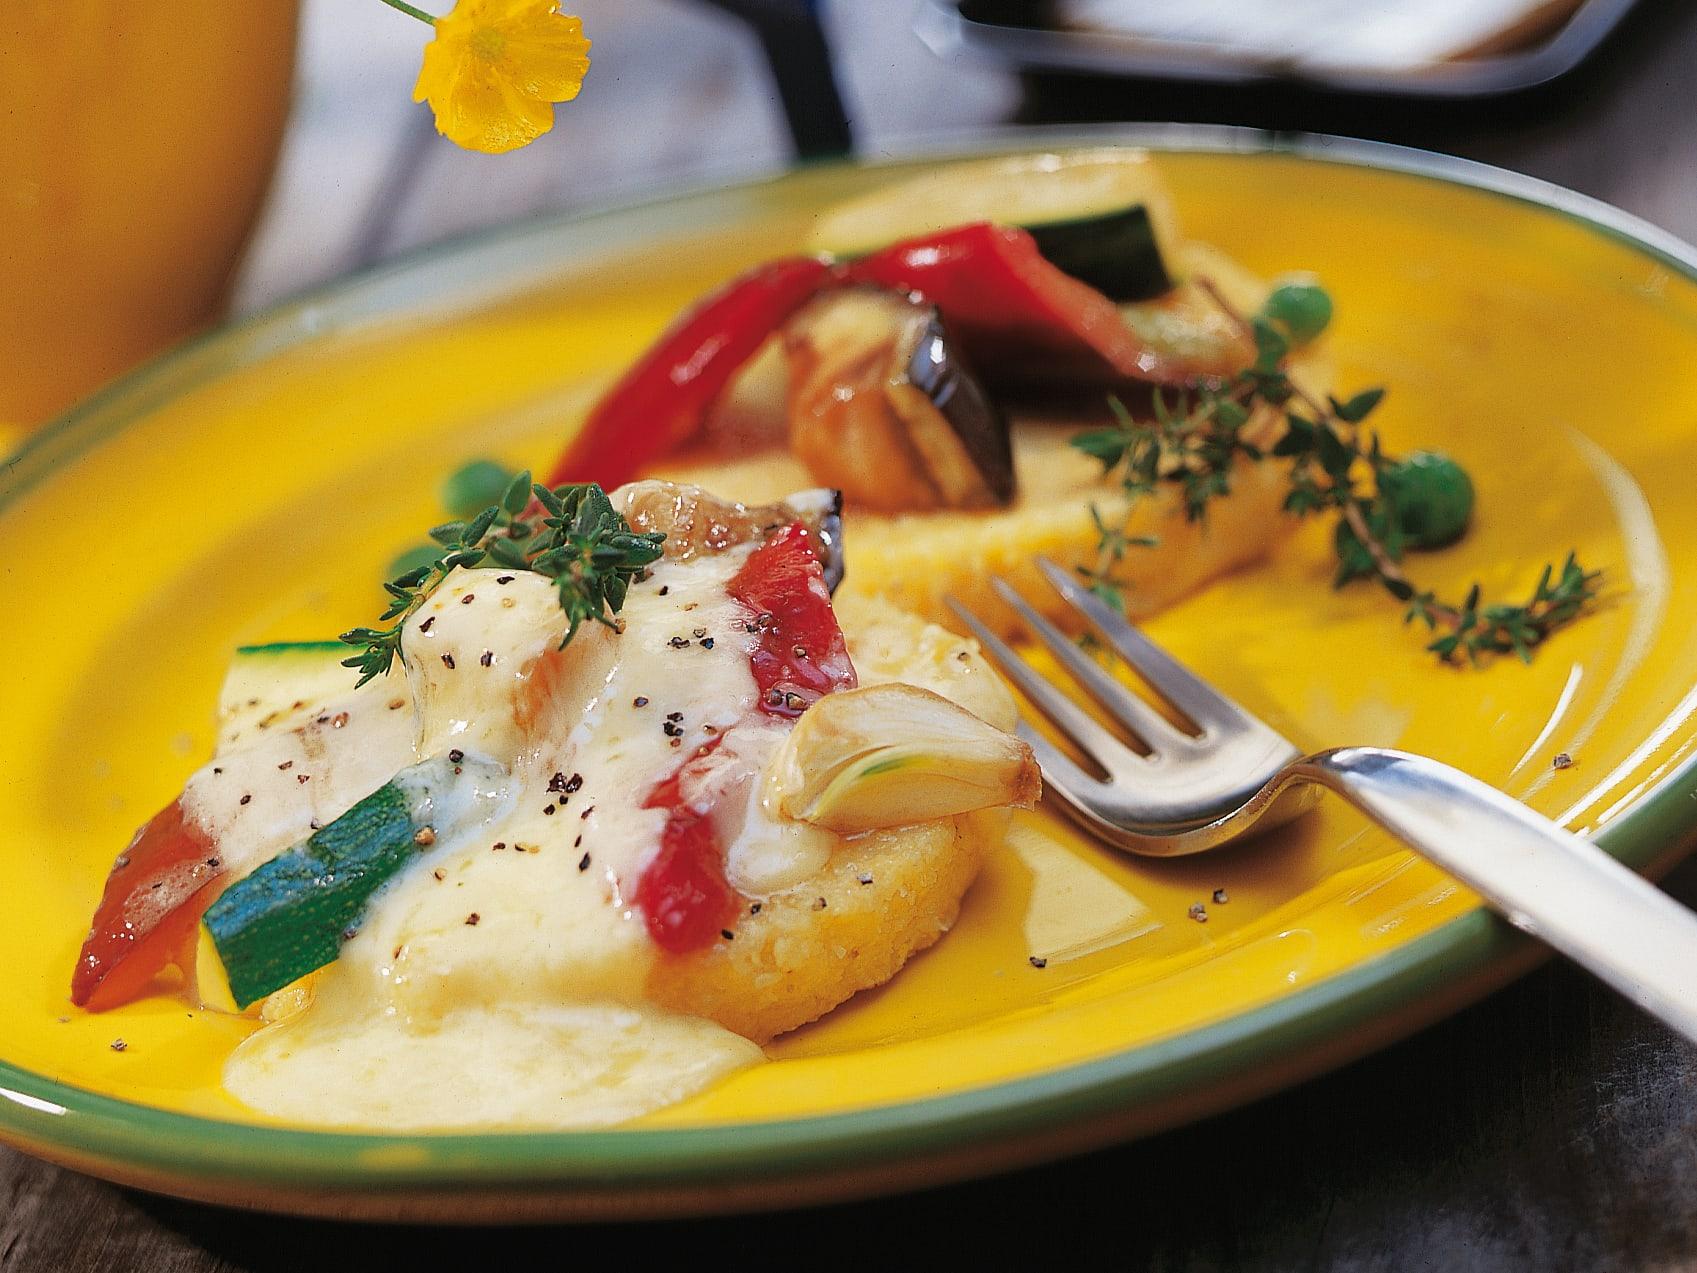 Polenta-Rondellen mit Ratatouille und Raclettekäse